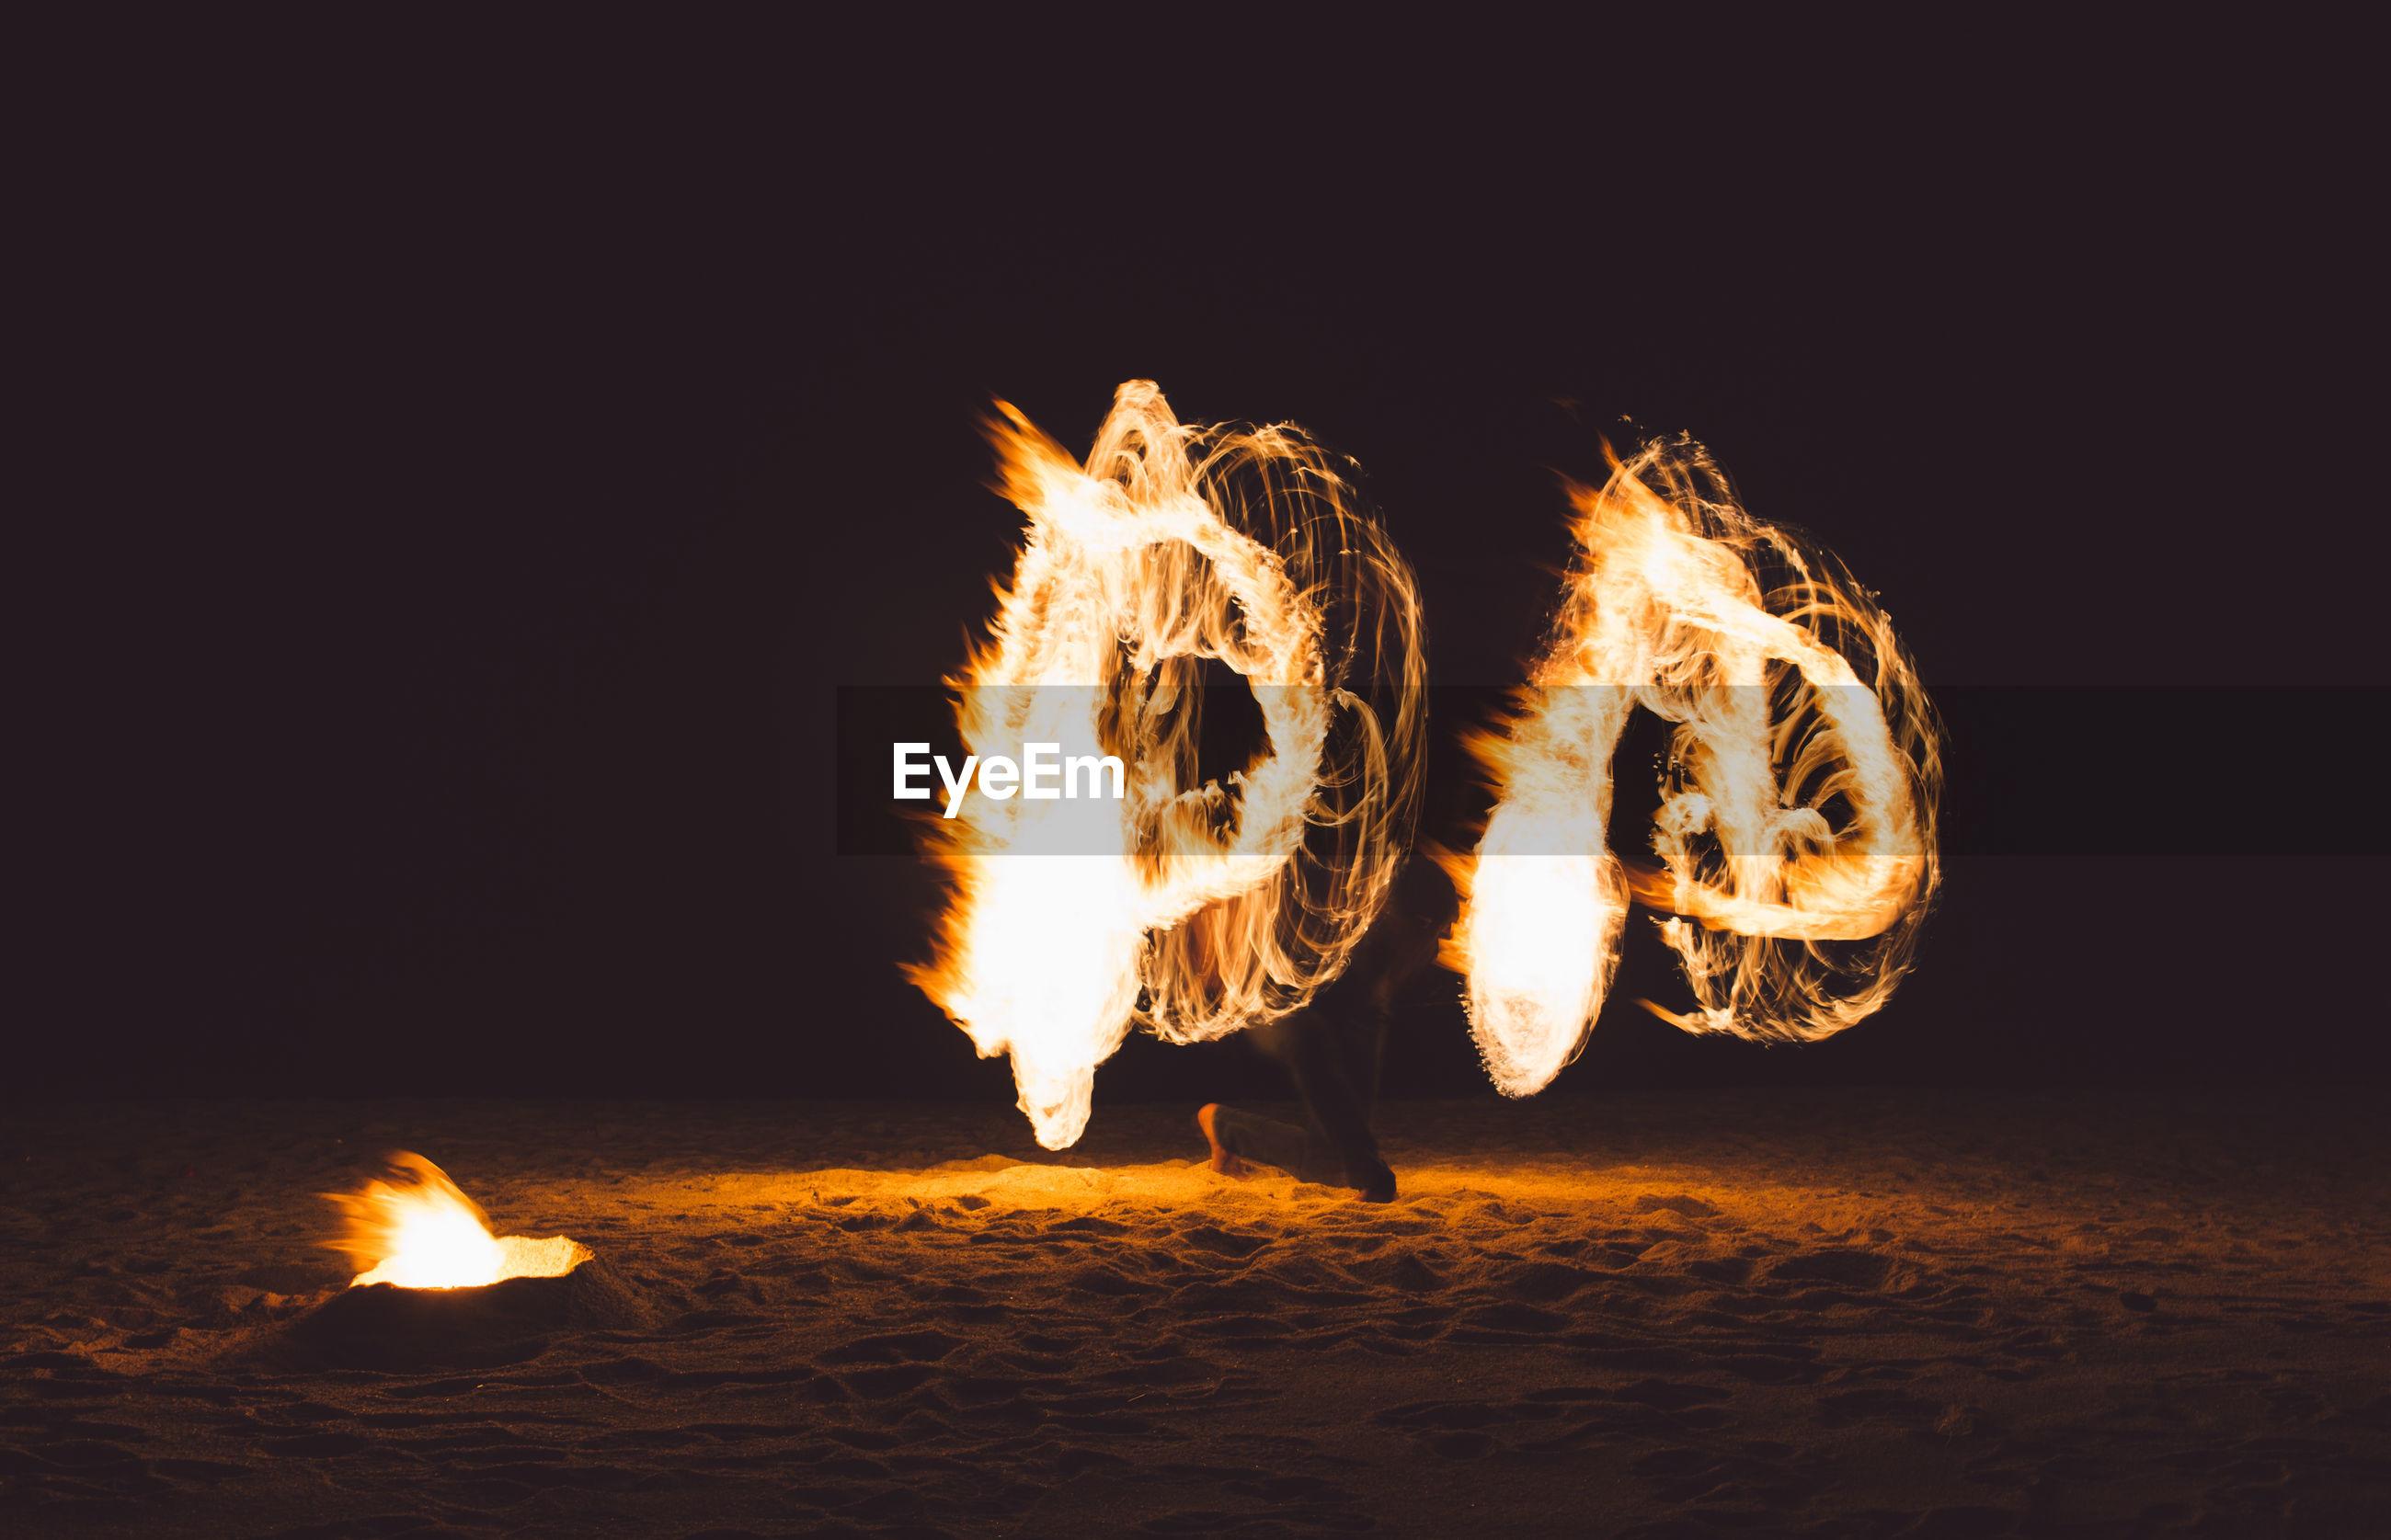 Bonfire on beach at night